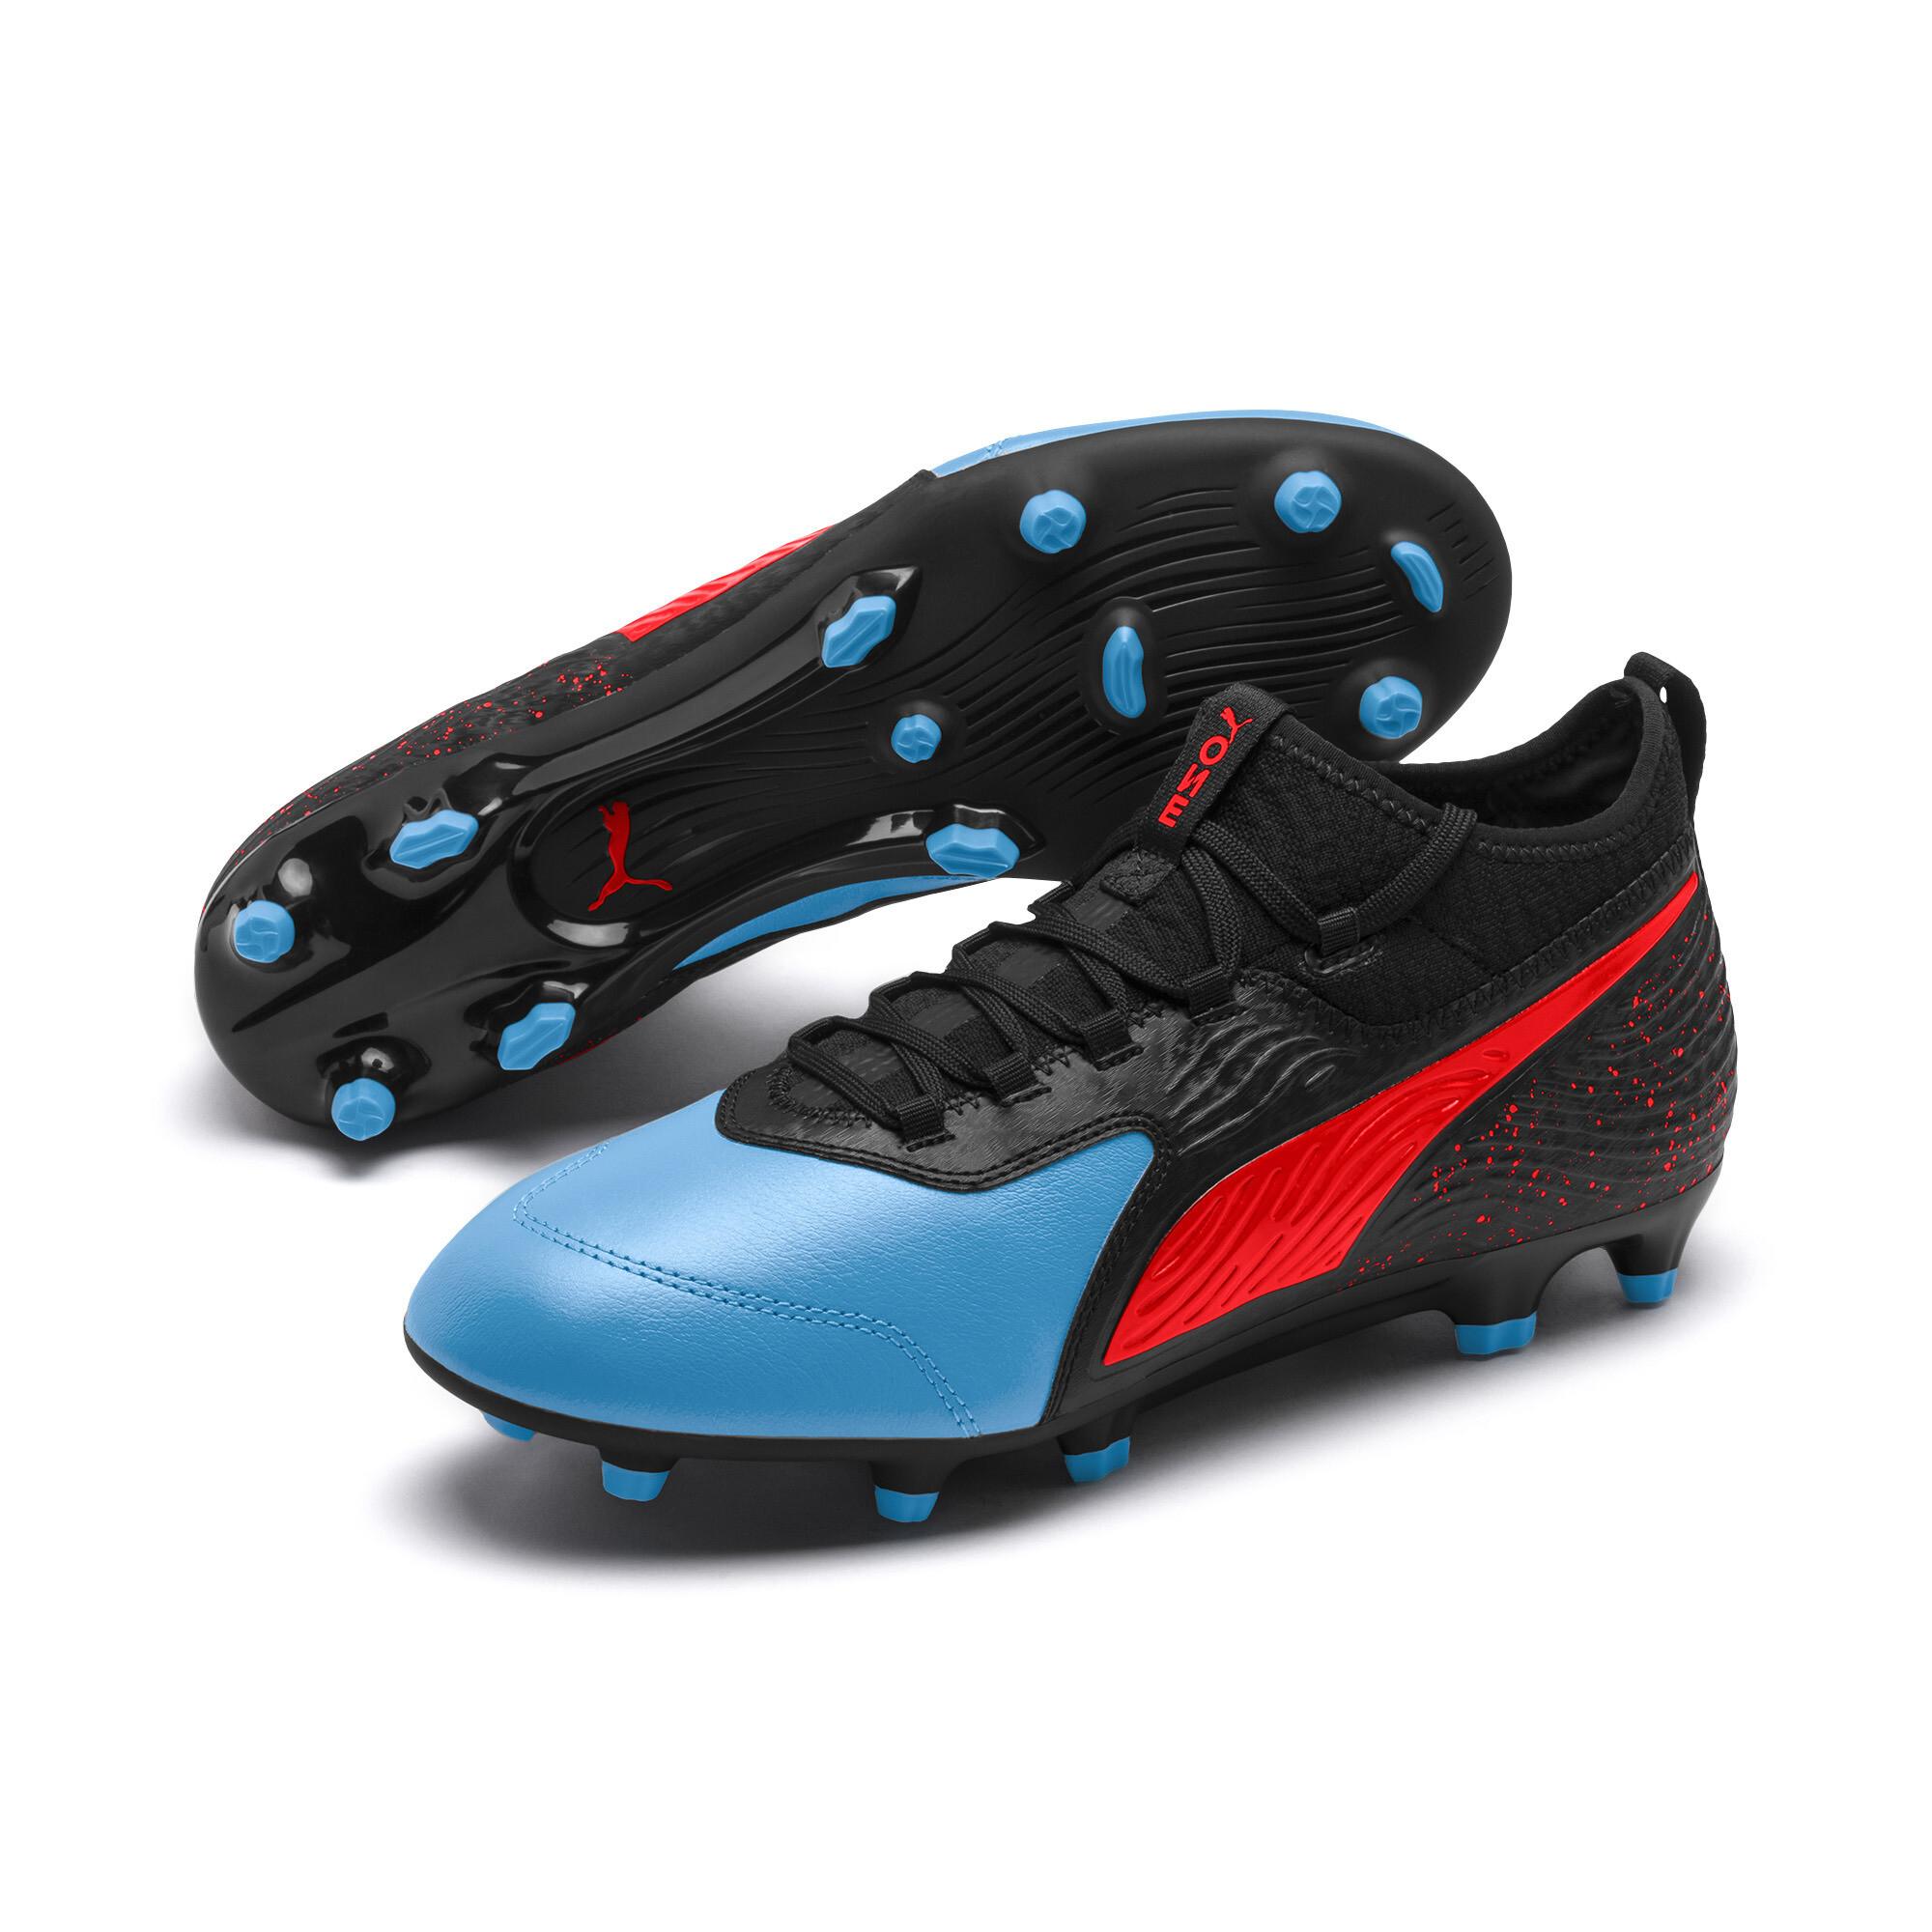 Image Puma PUMA ONE 19.3 FG/AG Men's Football Boots #2